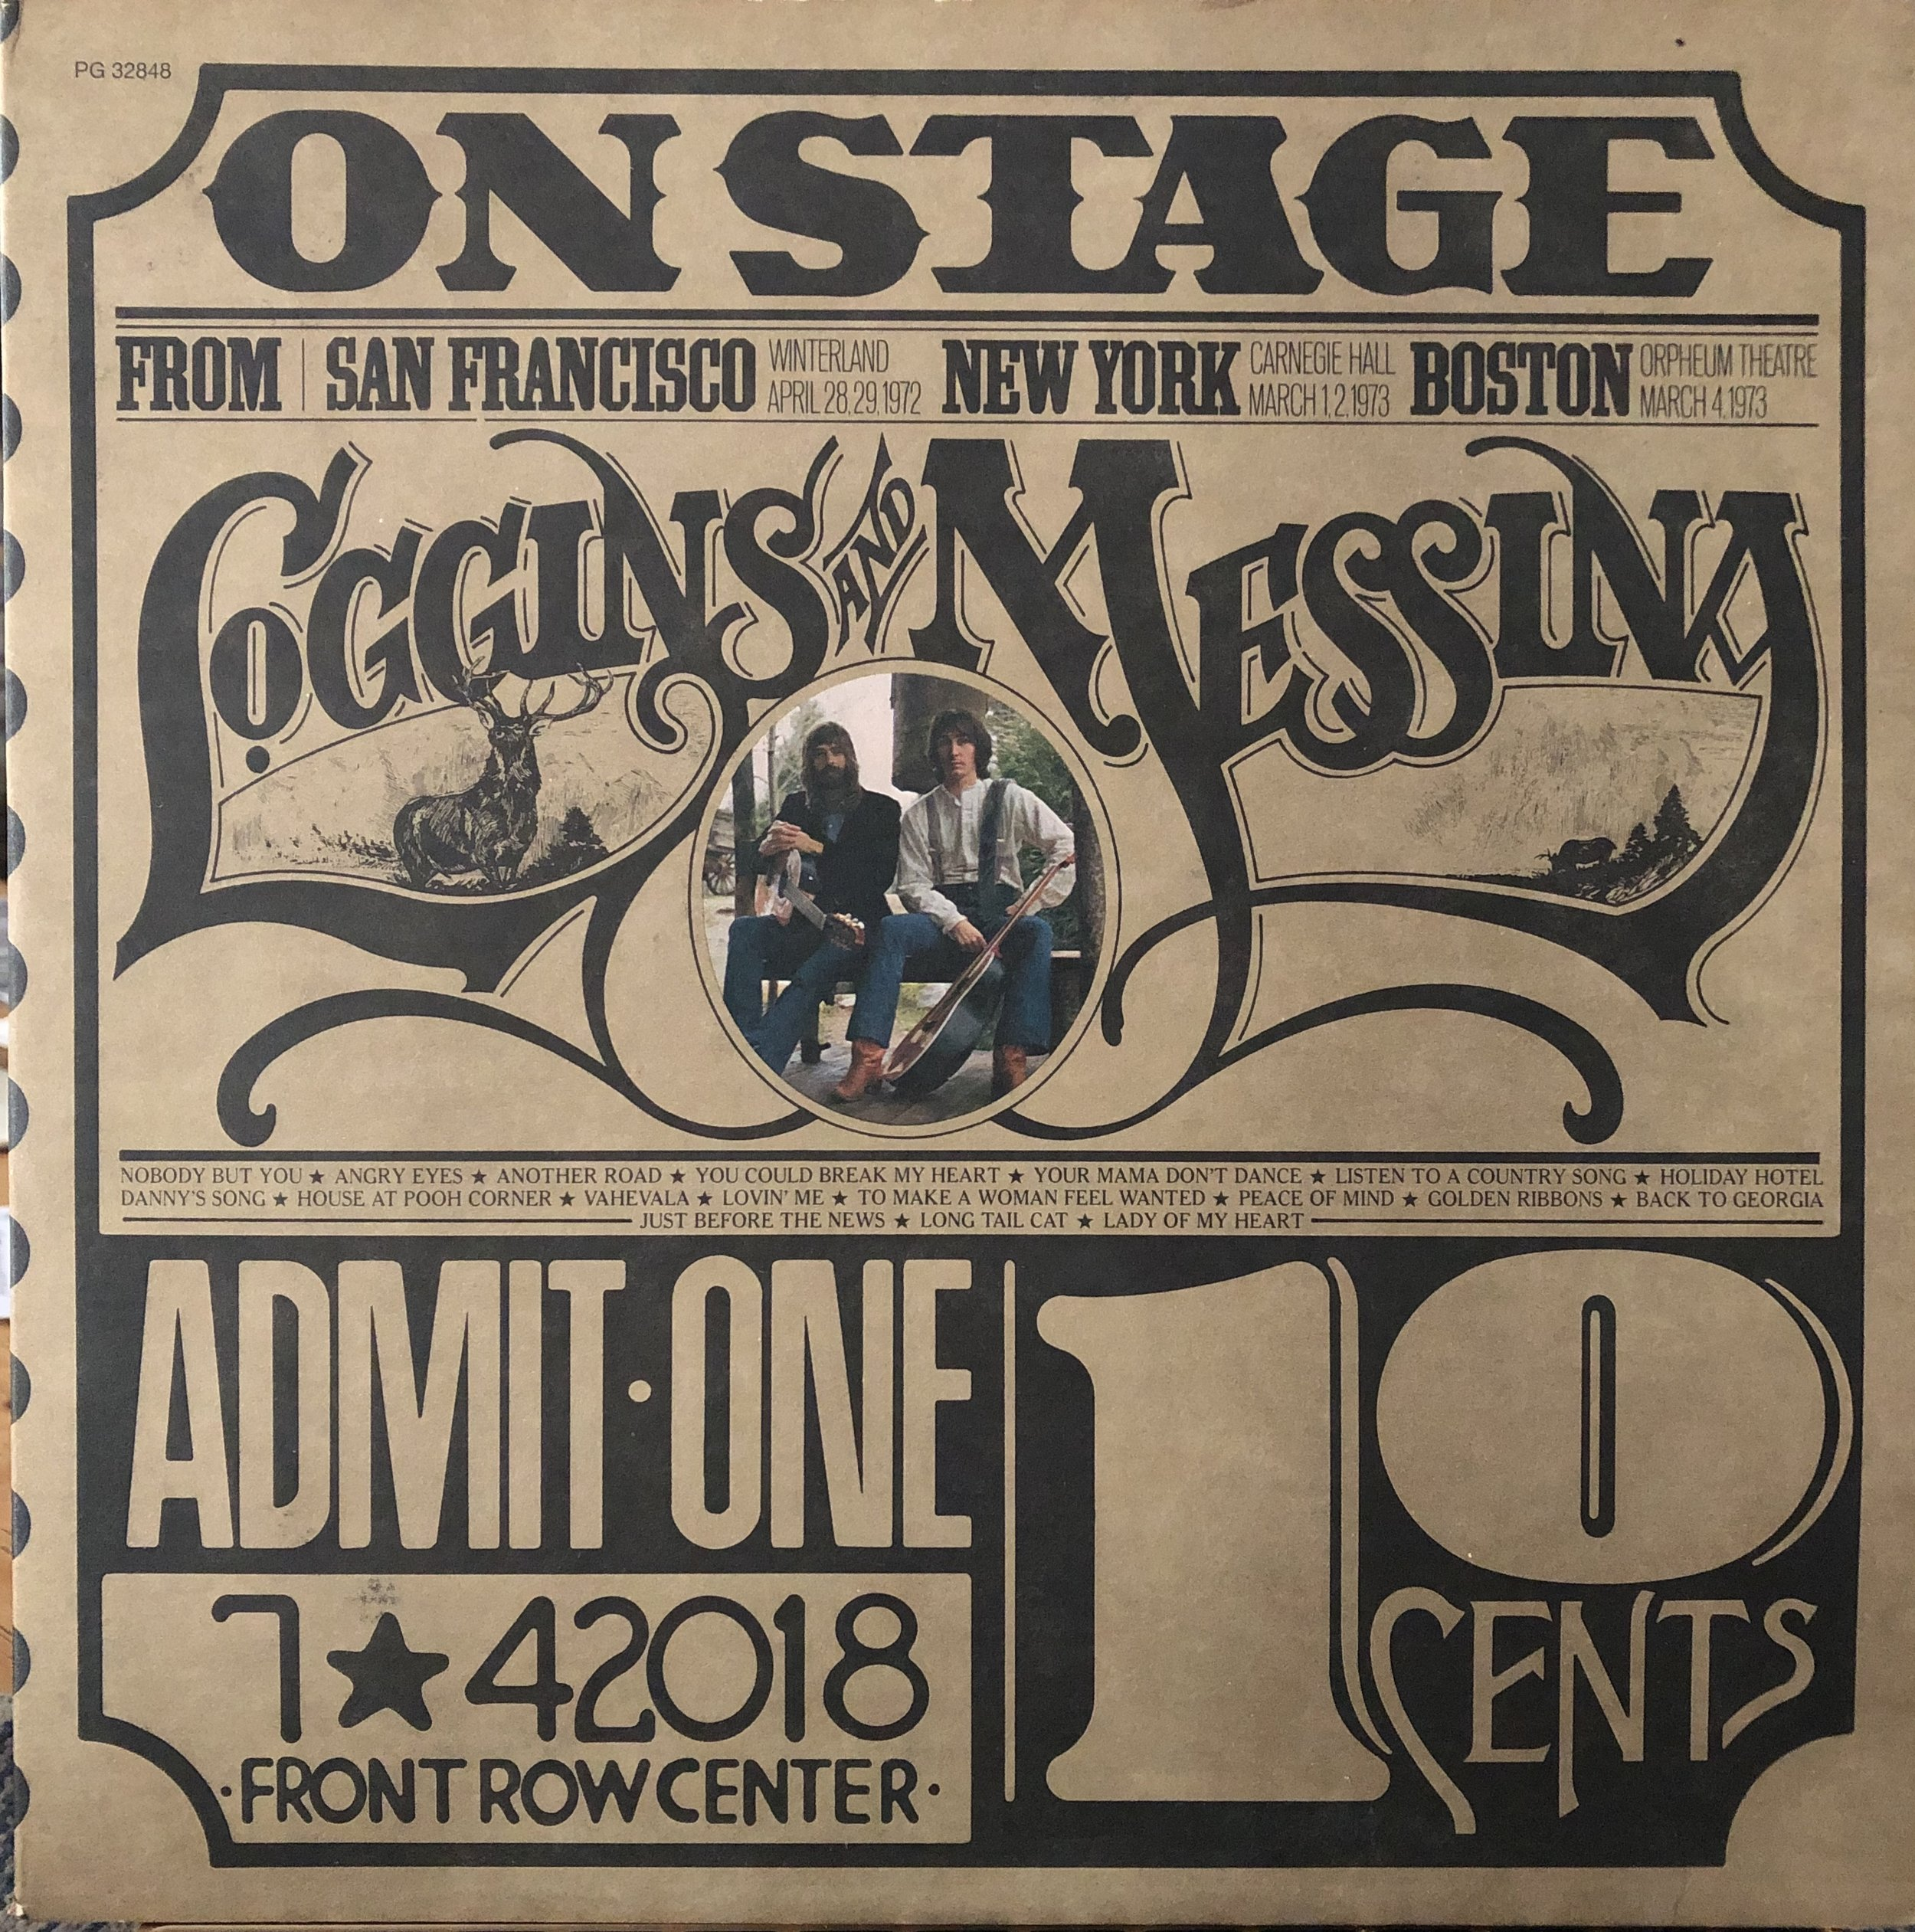 1974 On Stage.jpg